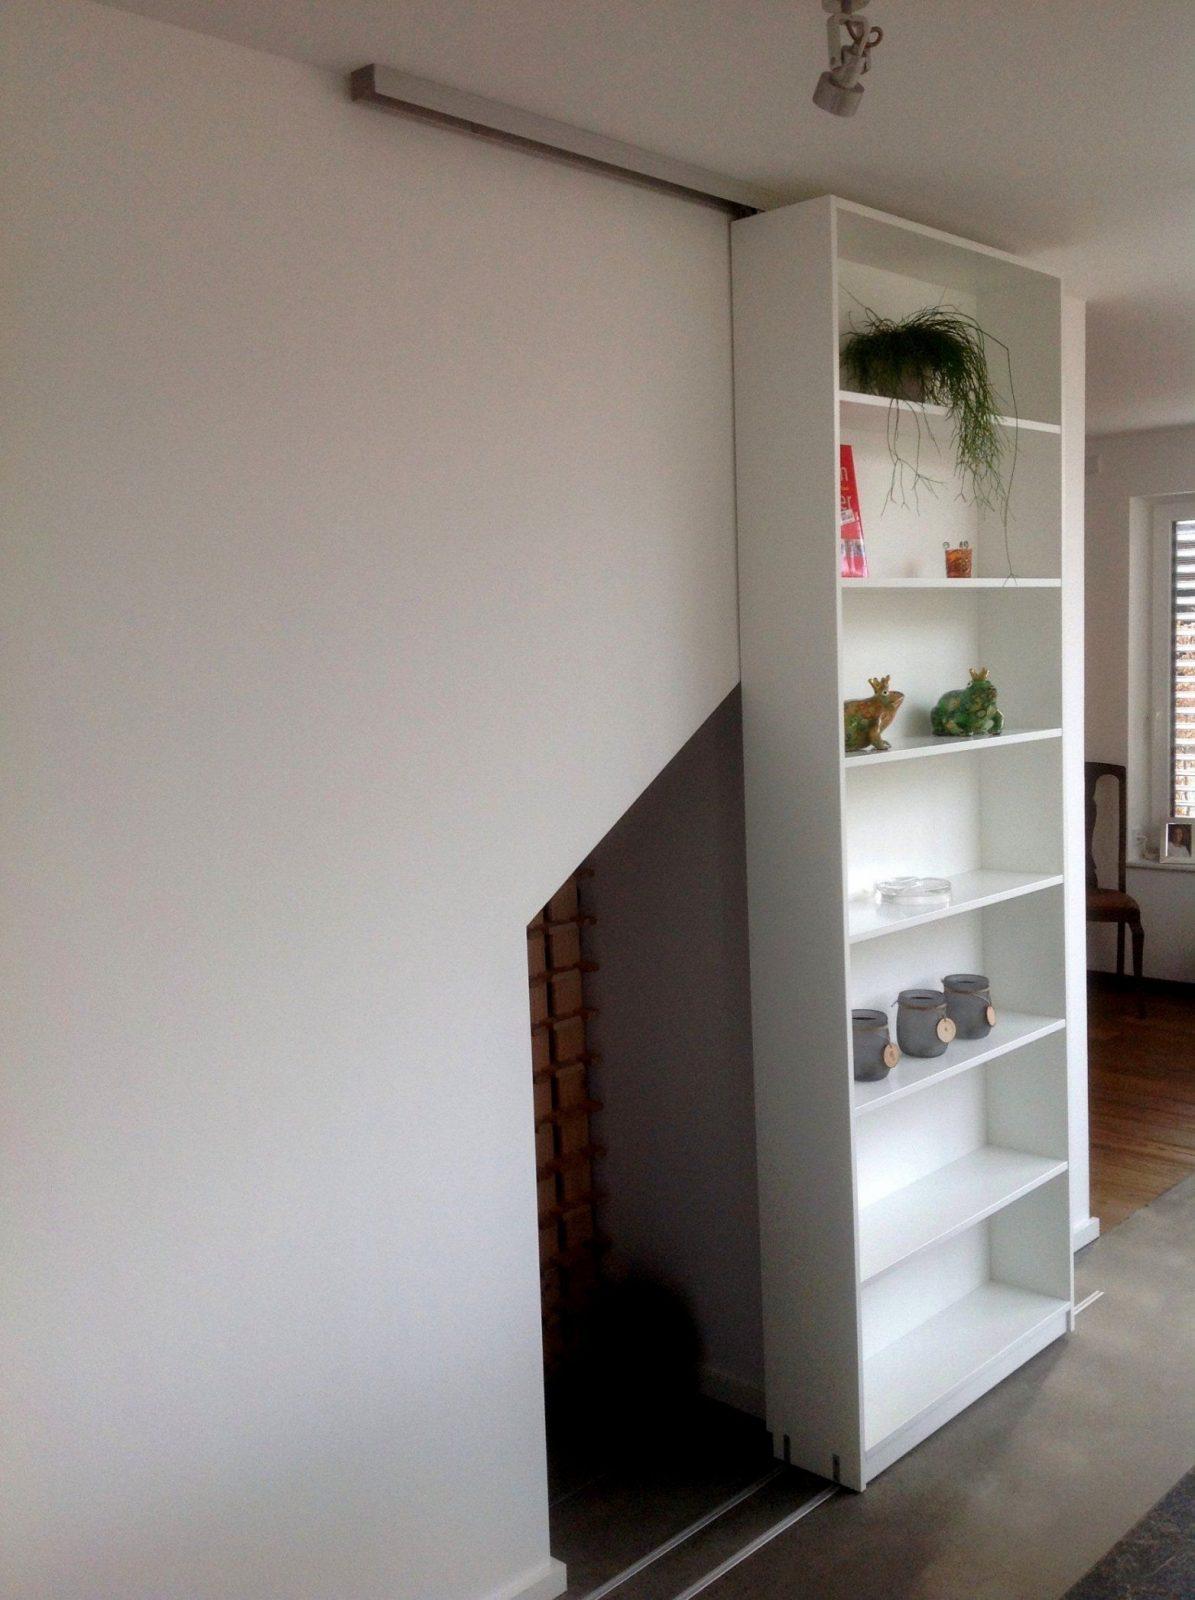 interessant raumteiler selber bauen fachwerk raumteiler schublade von fachwerk raumteiler selber. Black Bedroom Furniture Sets. Home Design Ideas